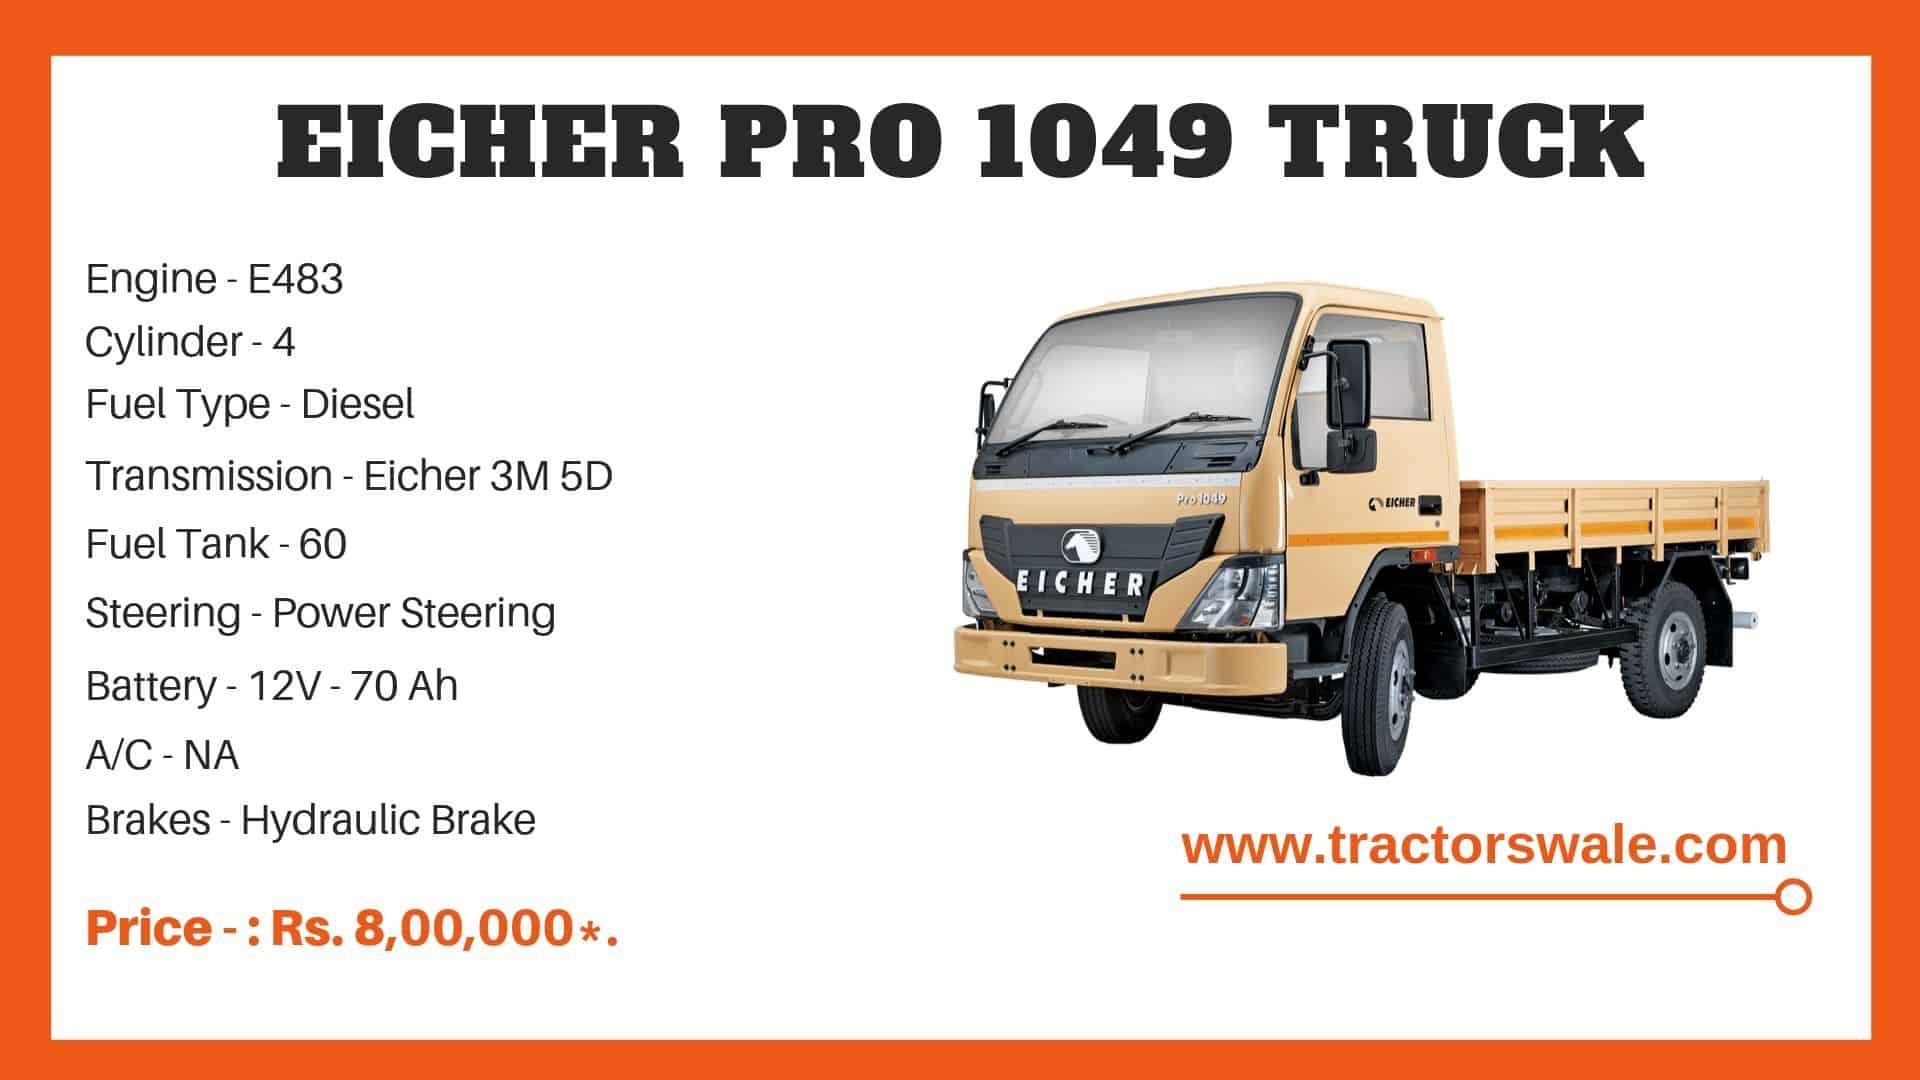 Specification Of Eicher Pro 1049 Truck